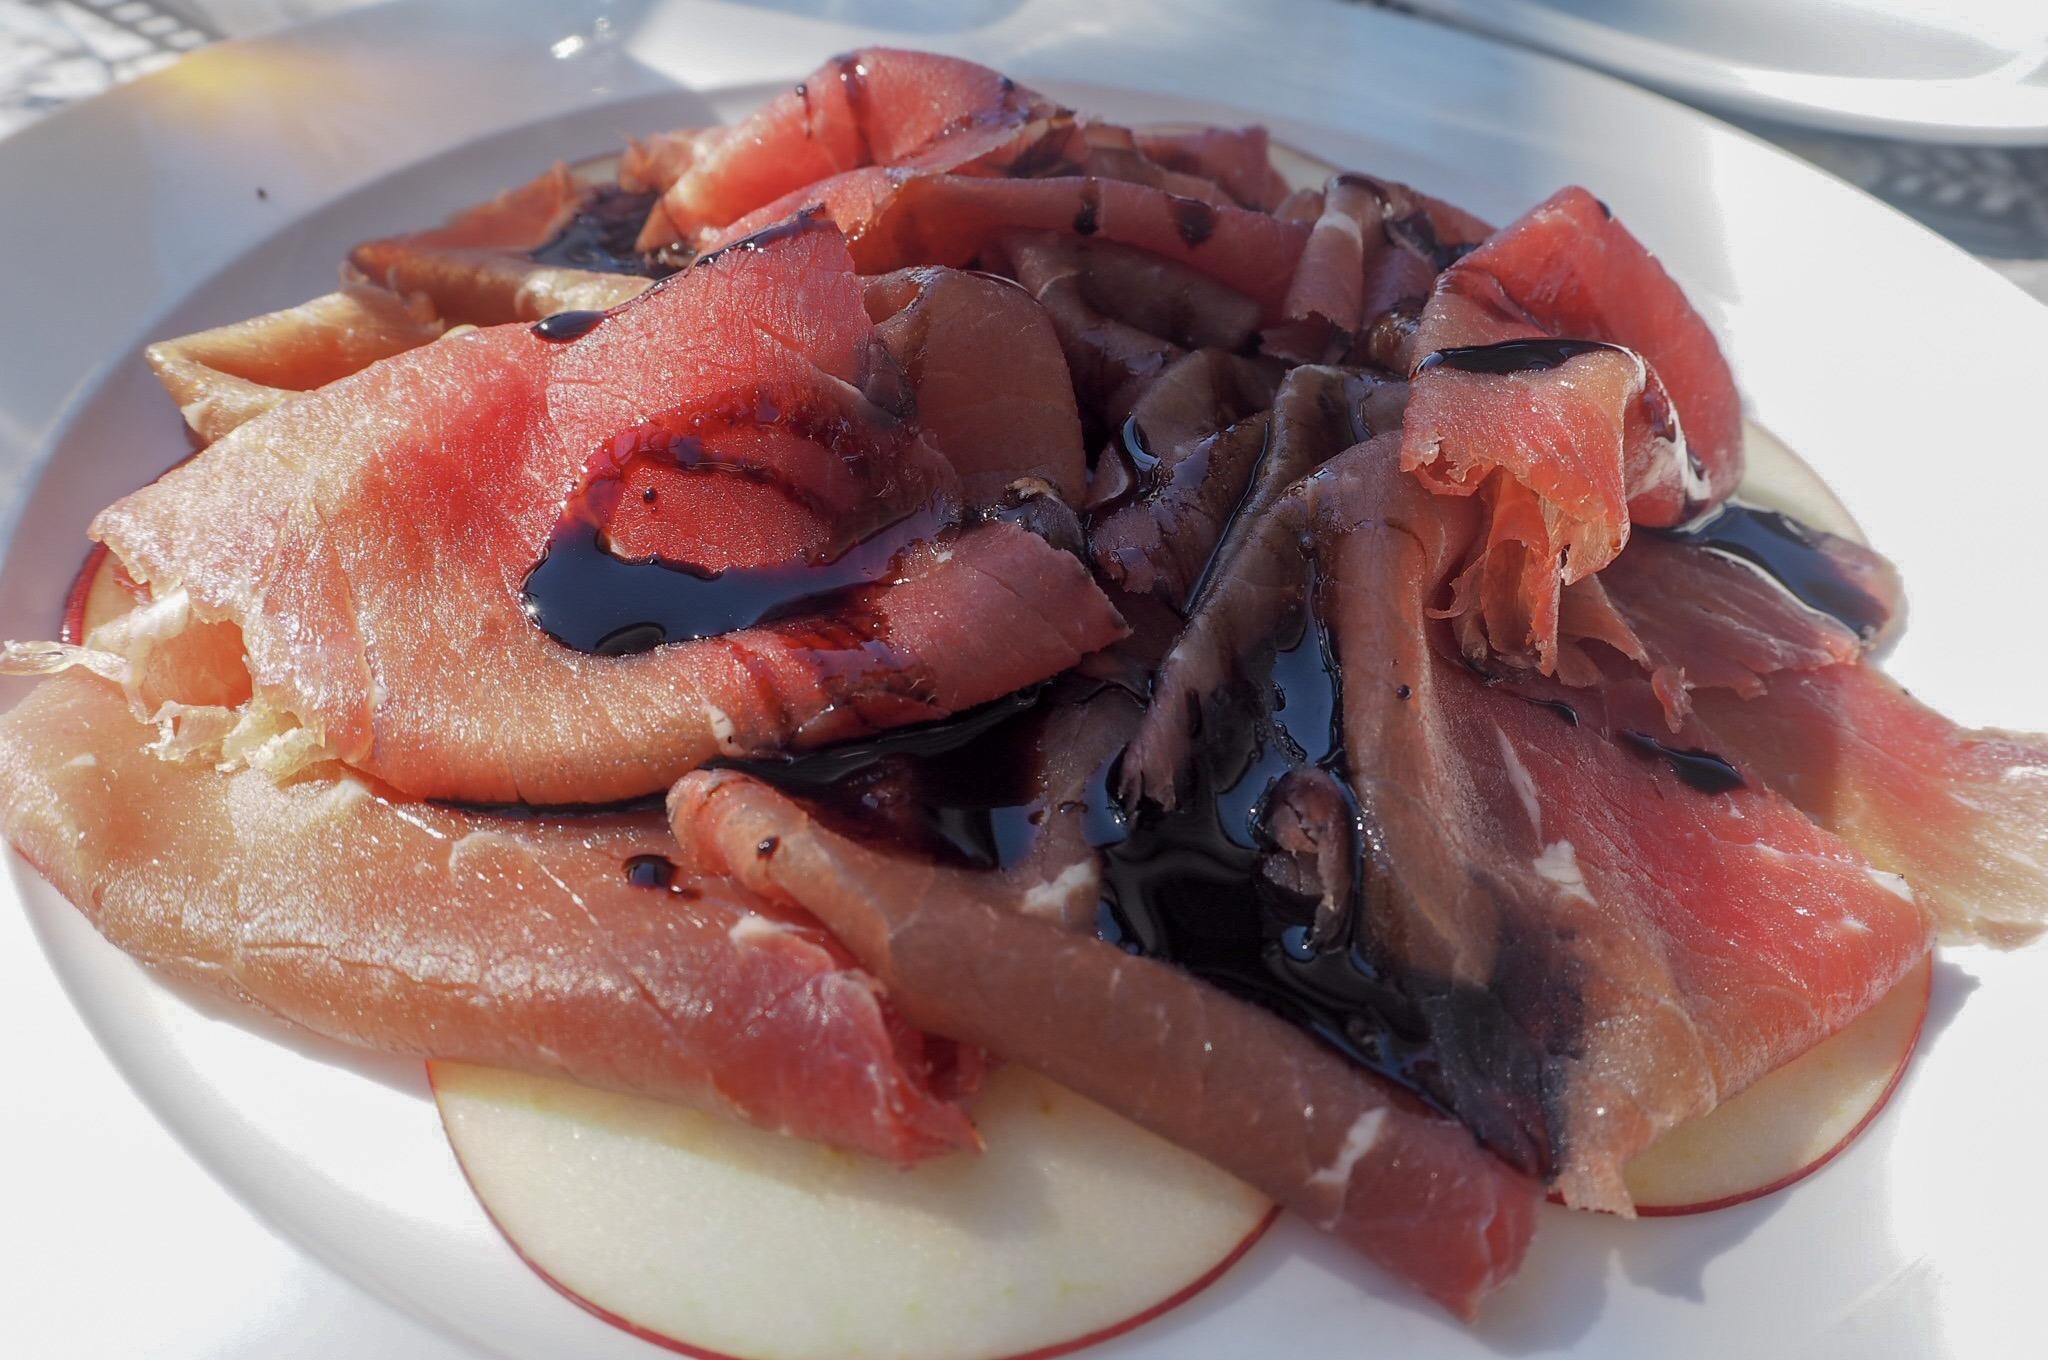 Salted beef with apple slices Panaromic Restaurant